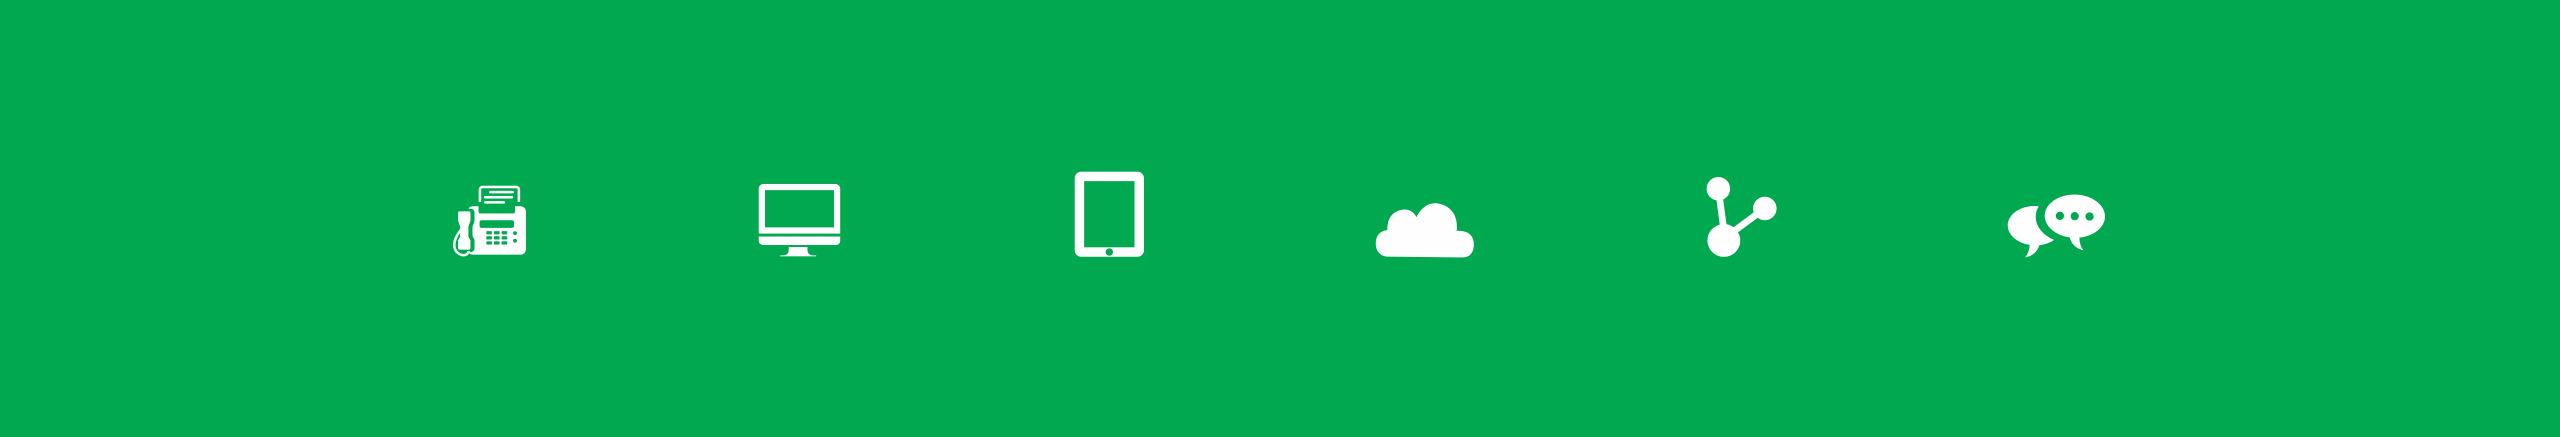 cti-technology_icons